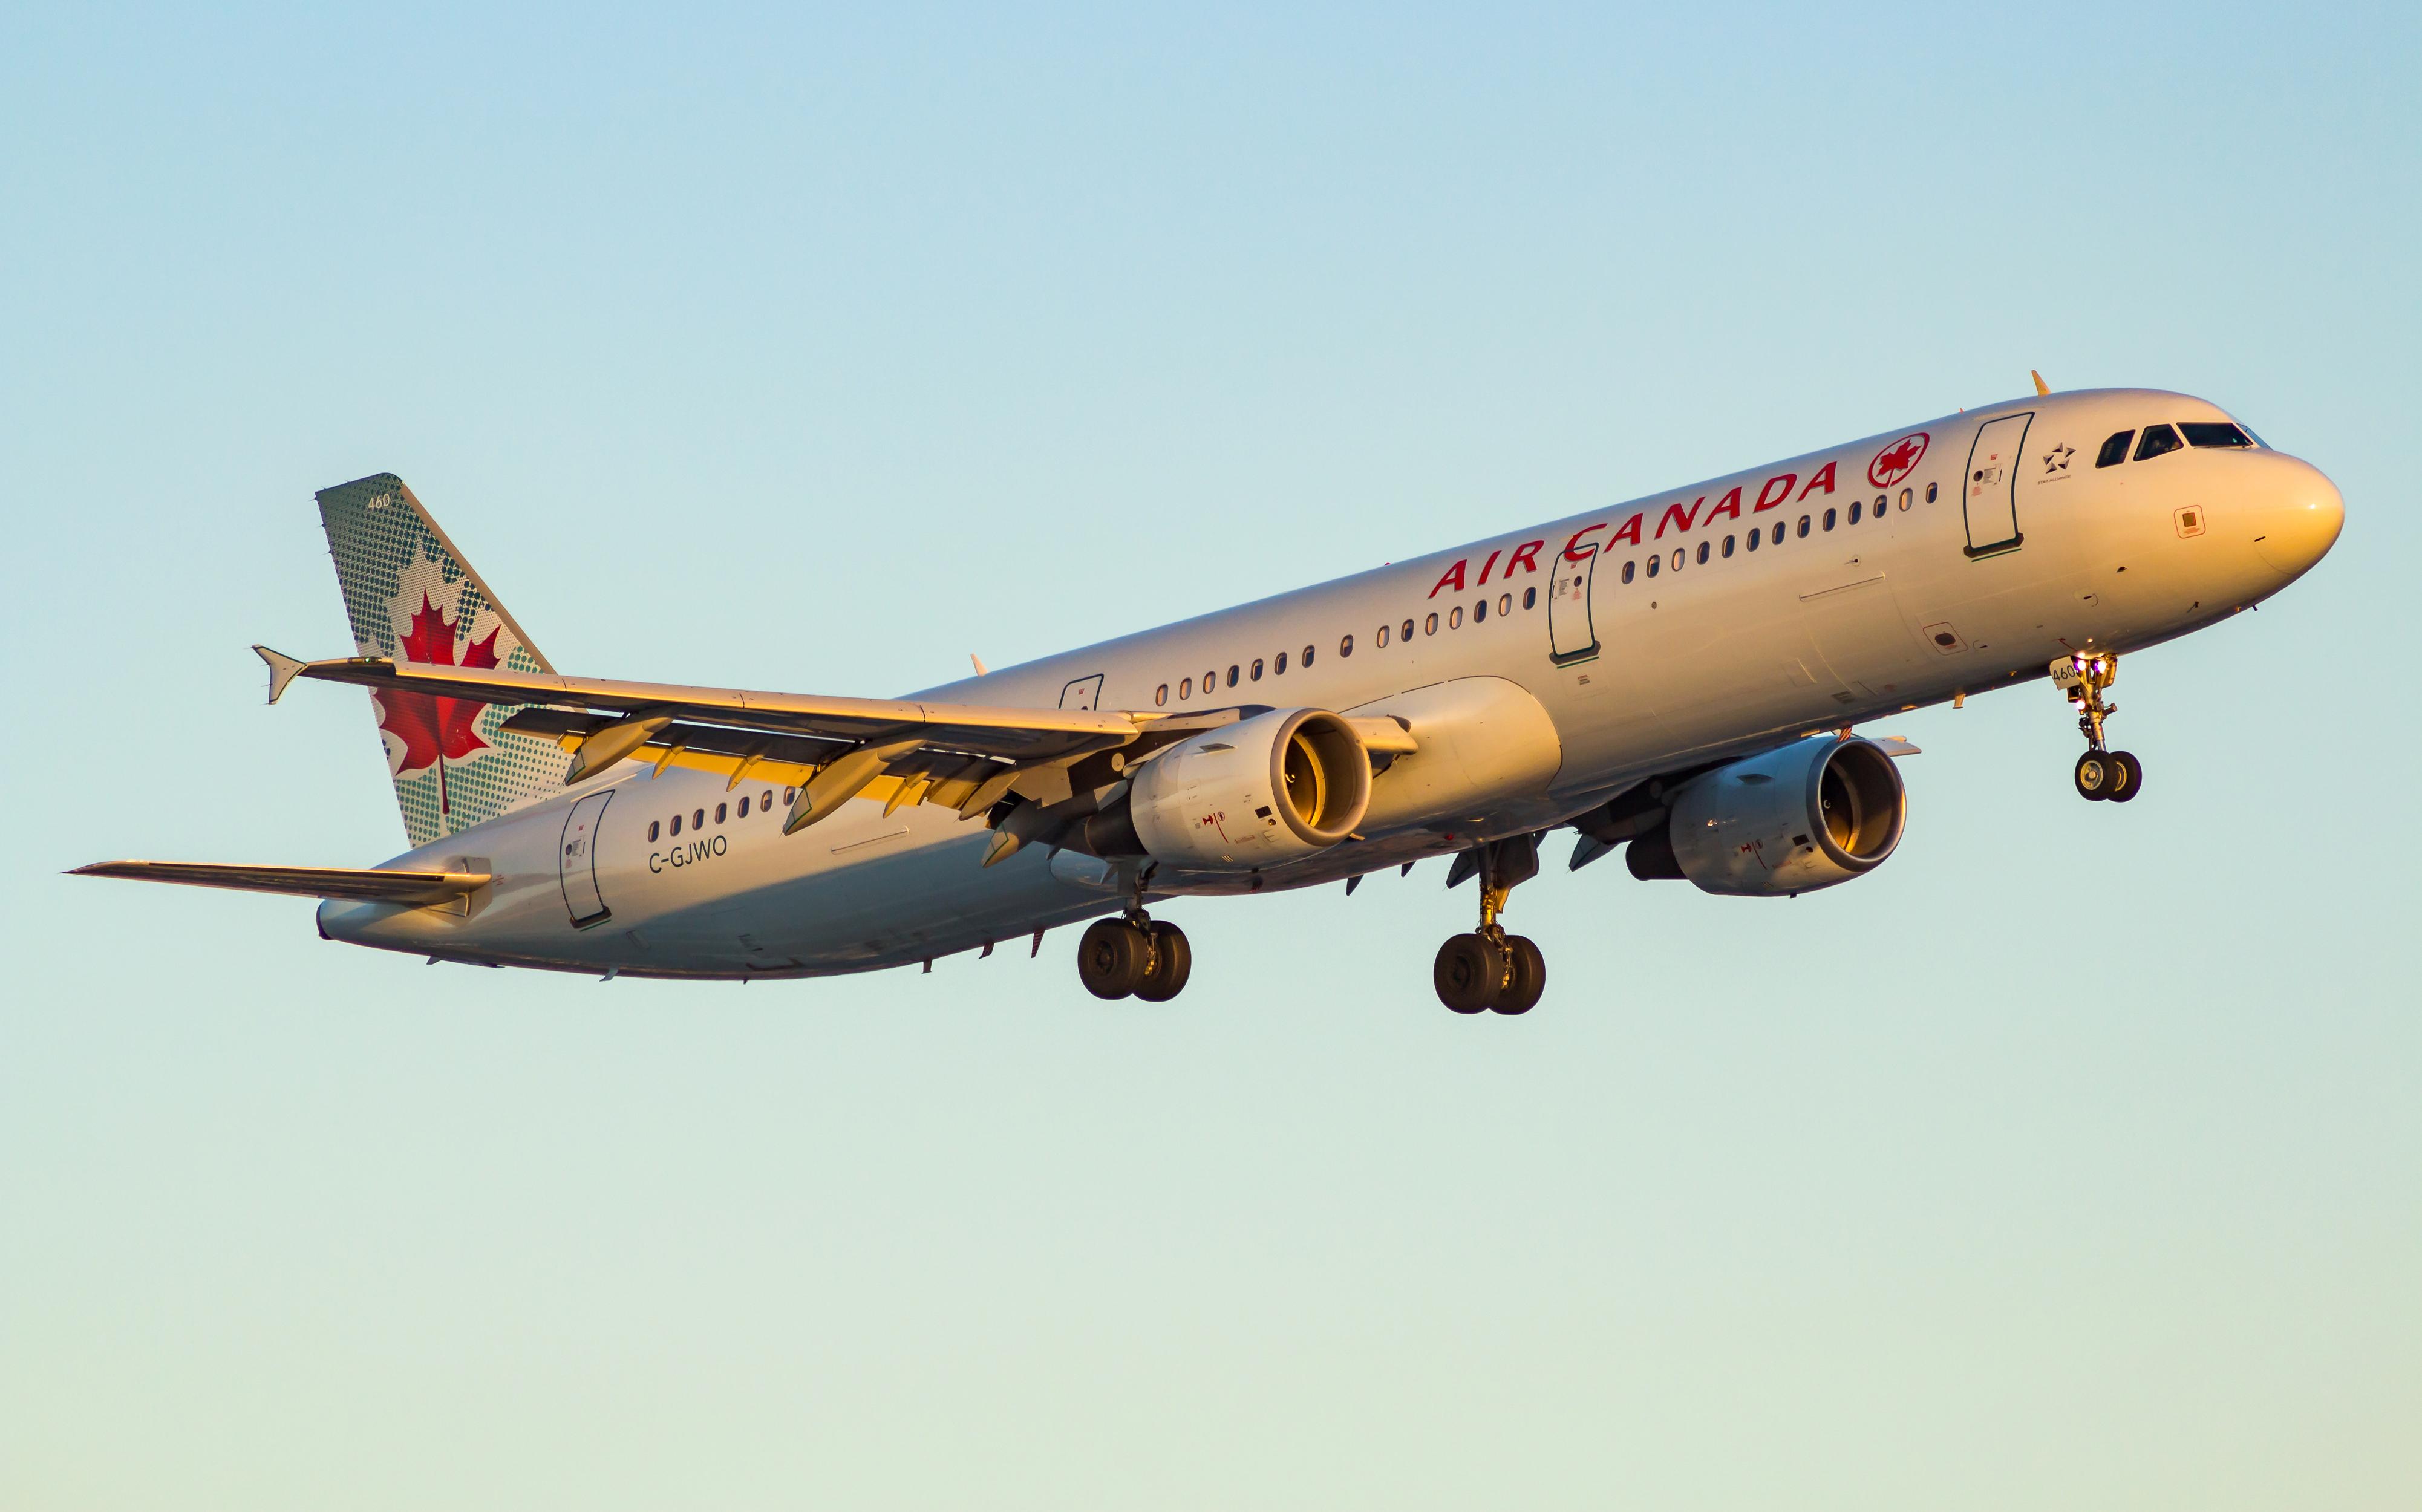 Desktop Wallpapers Aviation Airplane Passenger Airplanes 4004x2500 4004x2500